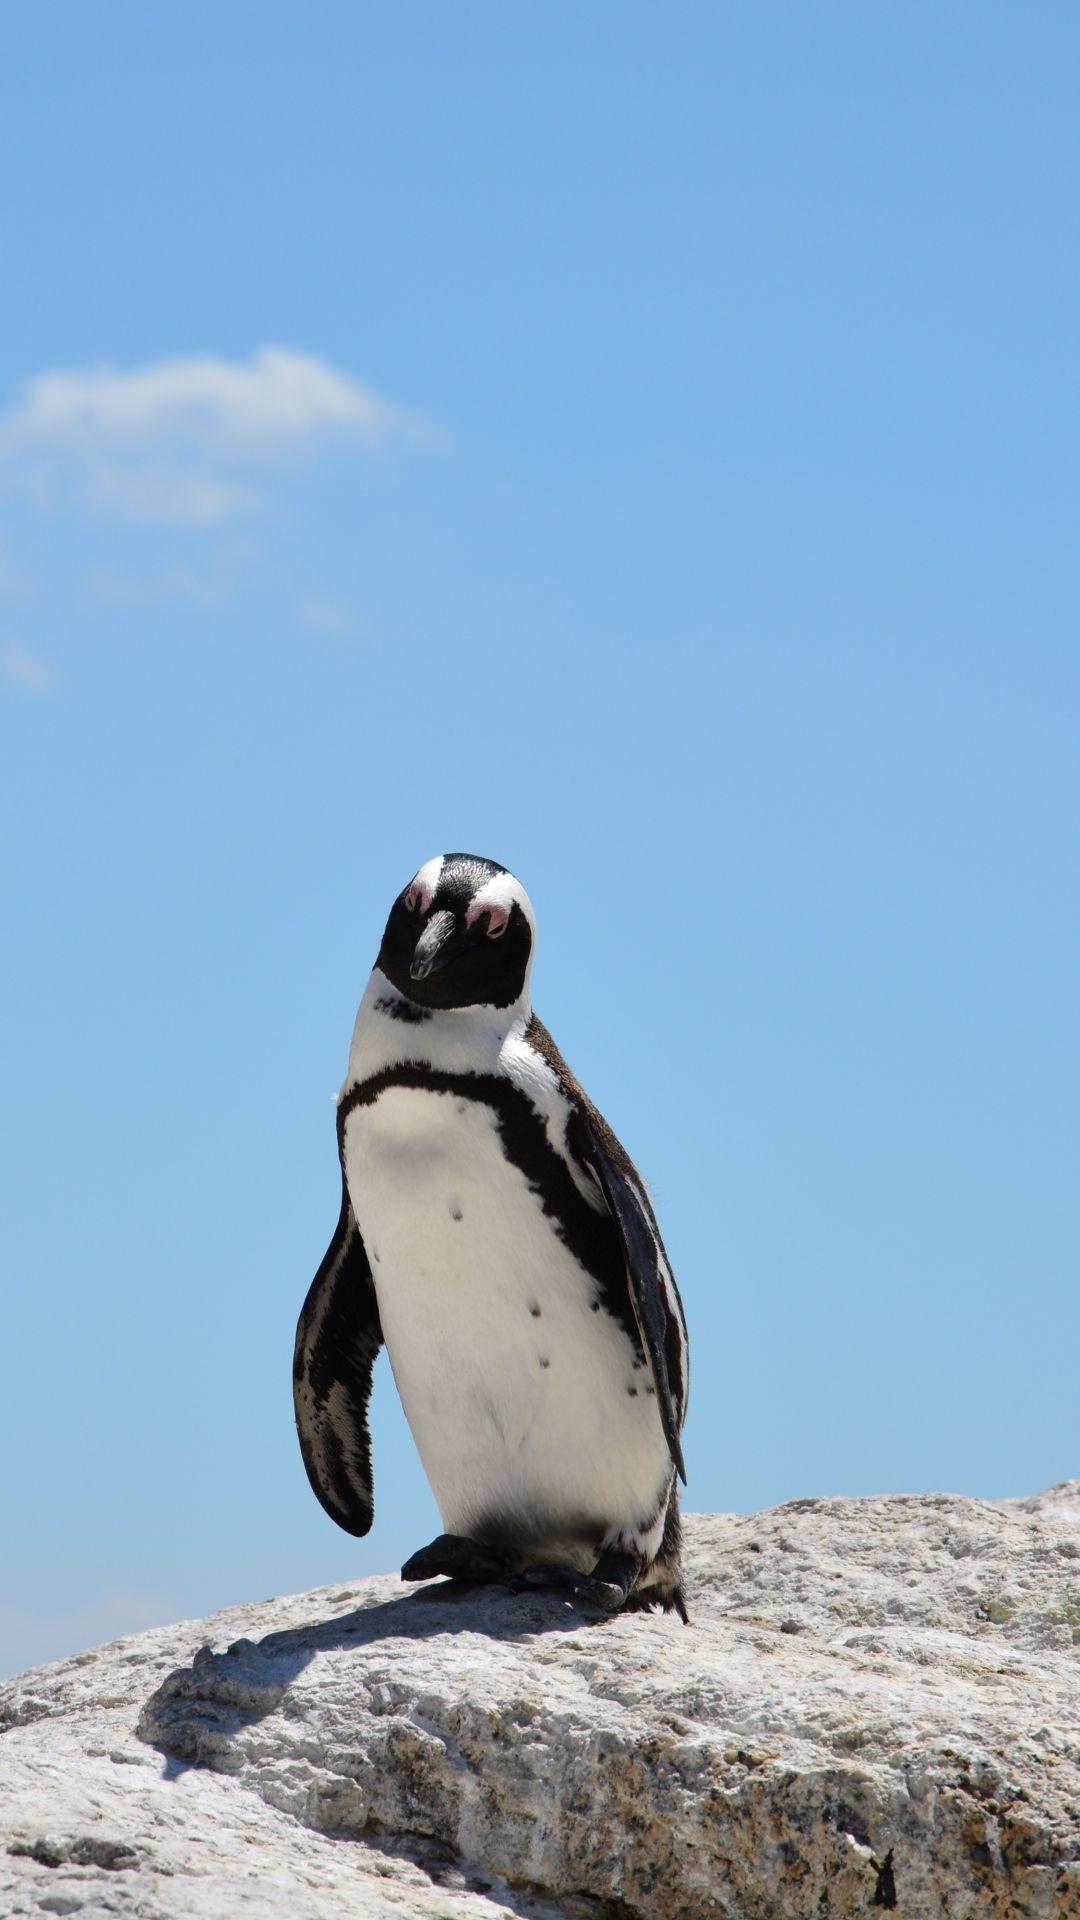 Penguin Rocks Sky Shadow iPhone 6 plus wallpaper